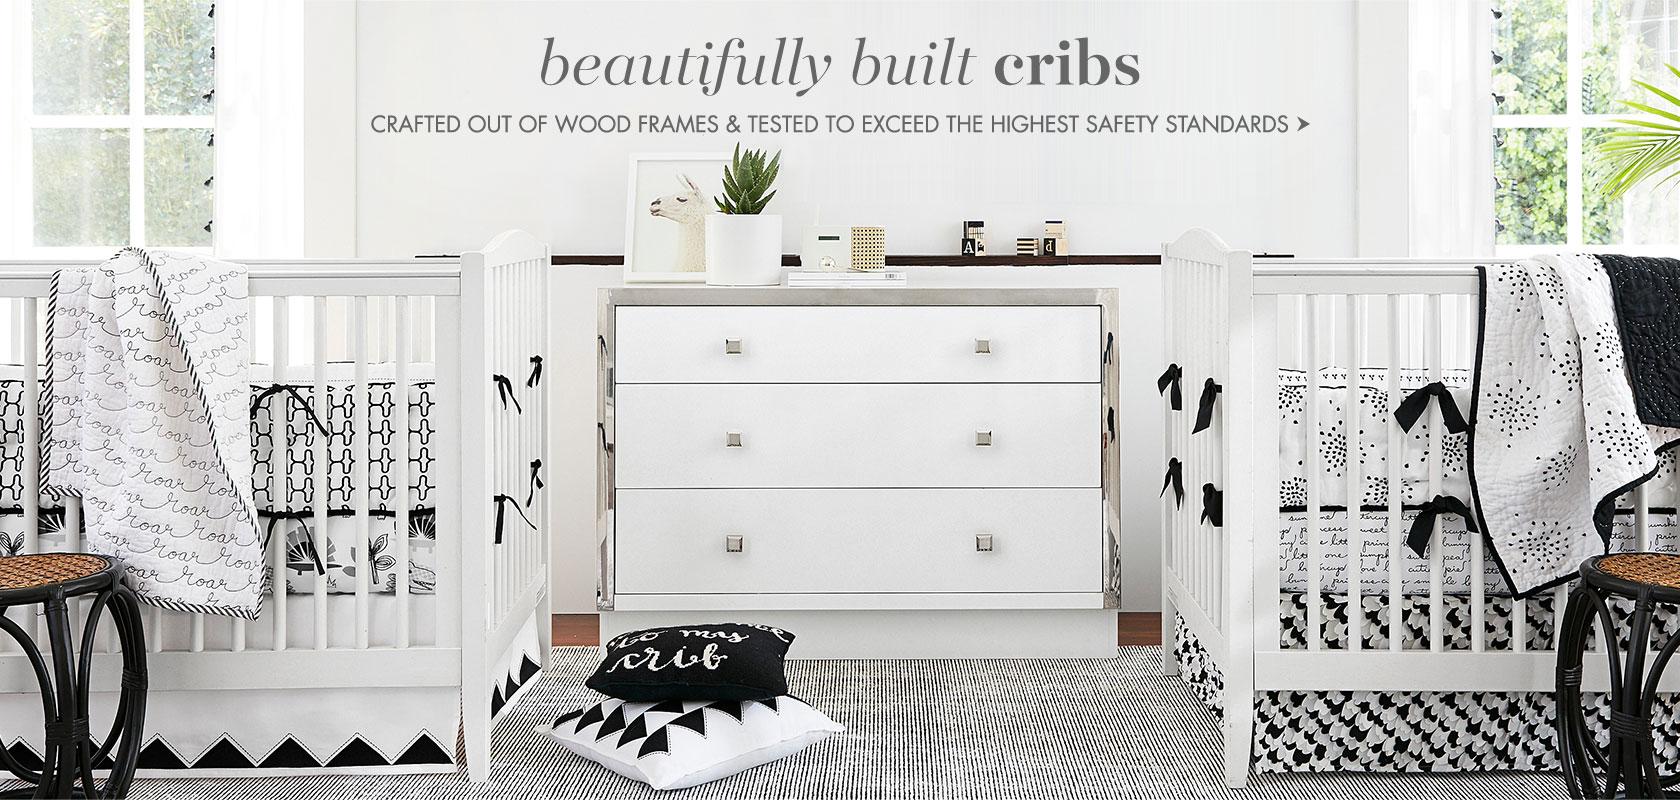 Beautifully build cribs